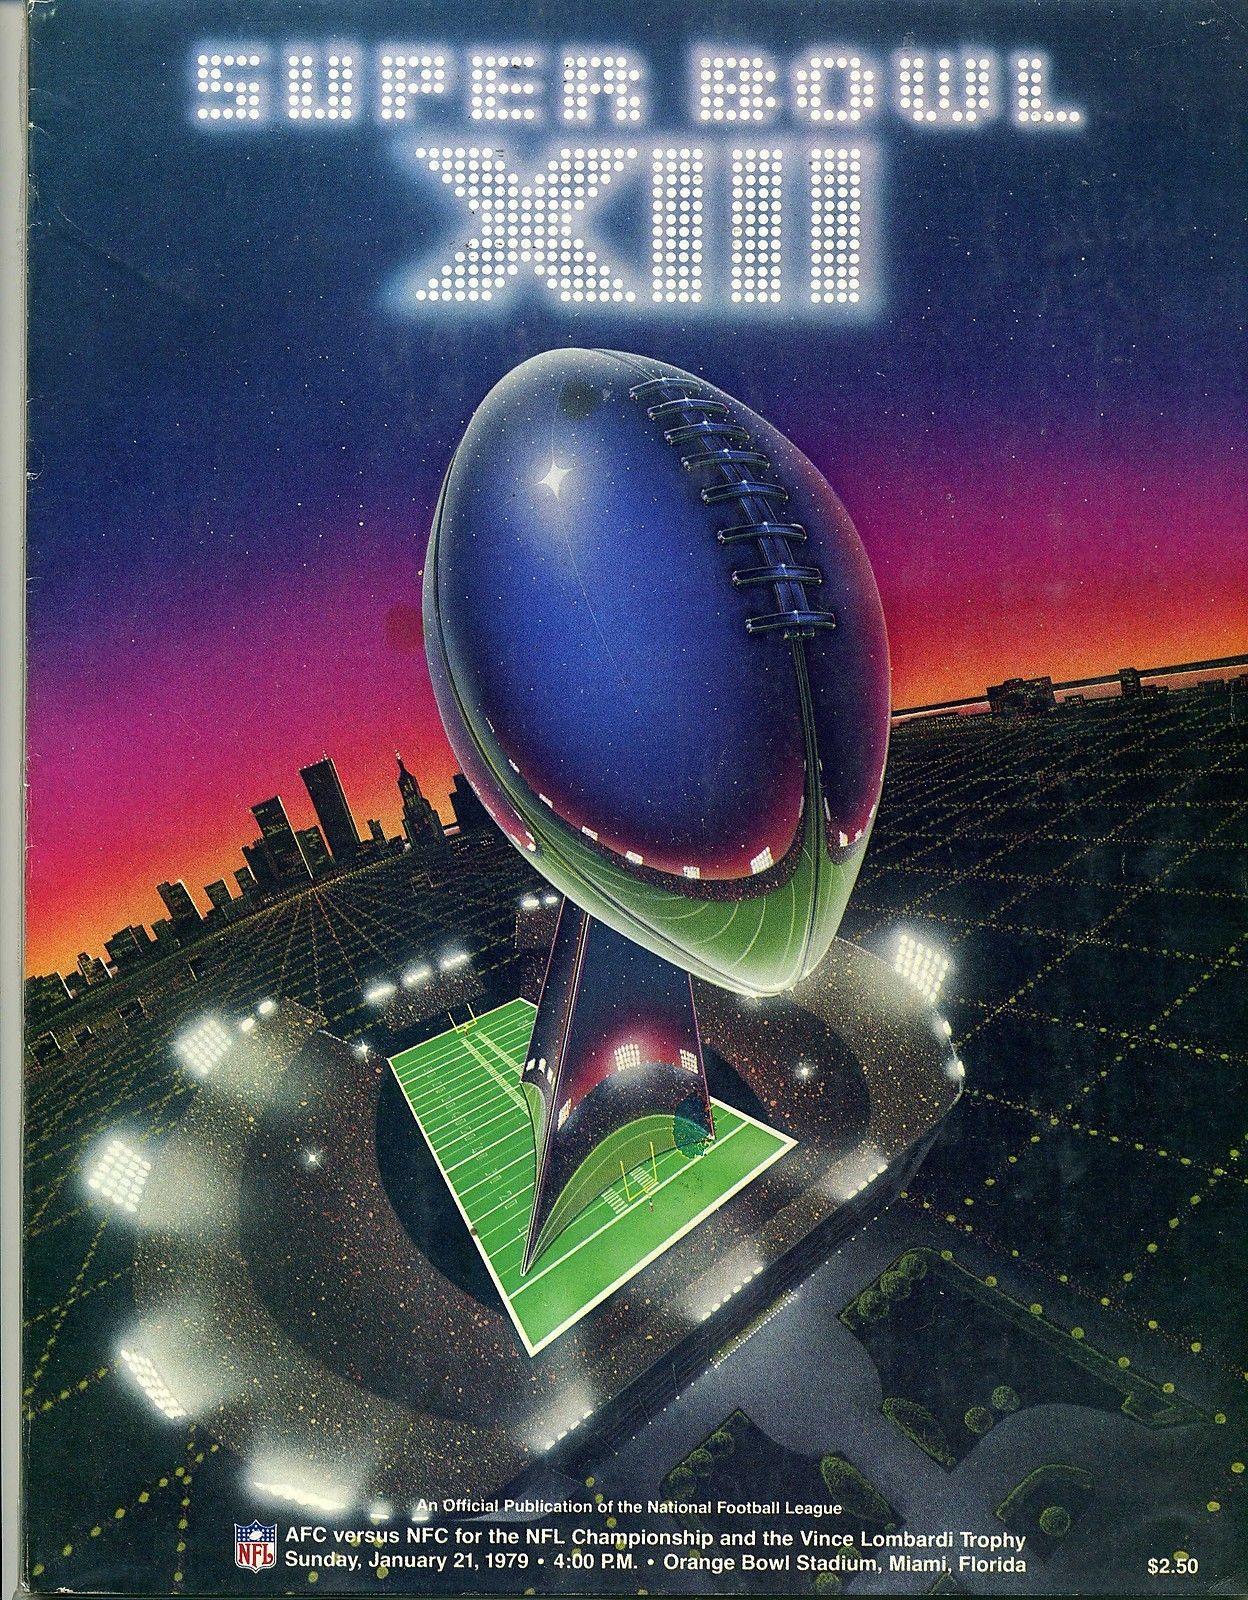 02 - Jan 21 1979 Super Bowl XII Miami, FL - Cowboys vs. Steelers program